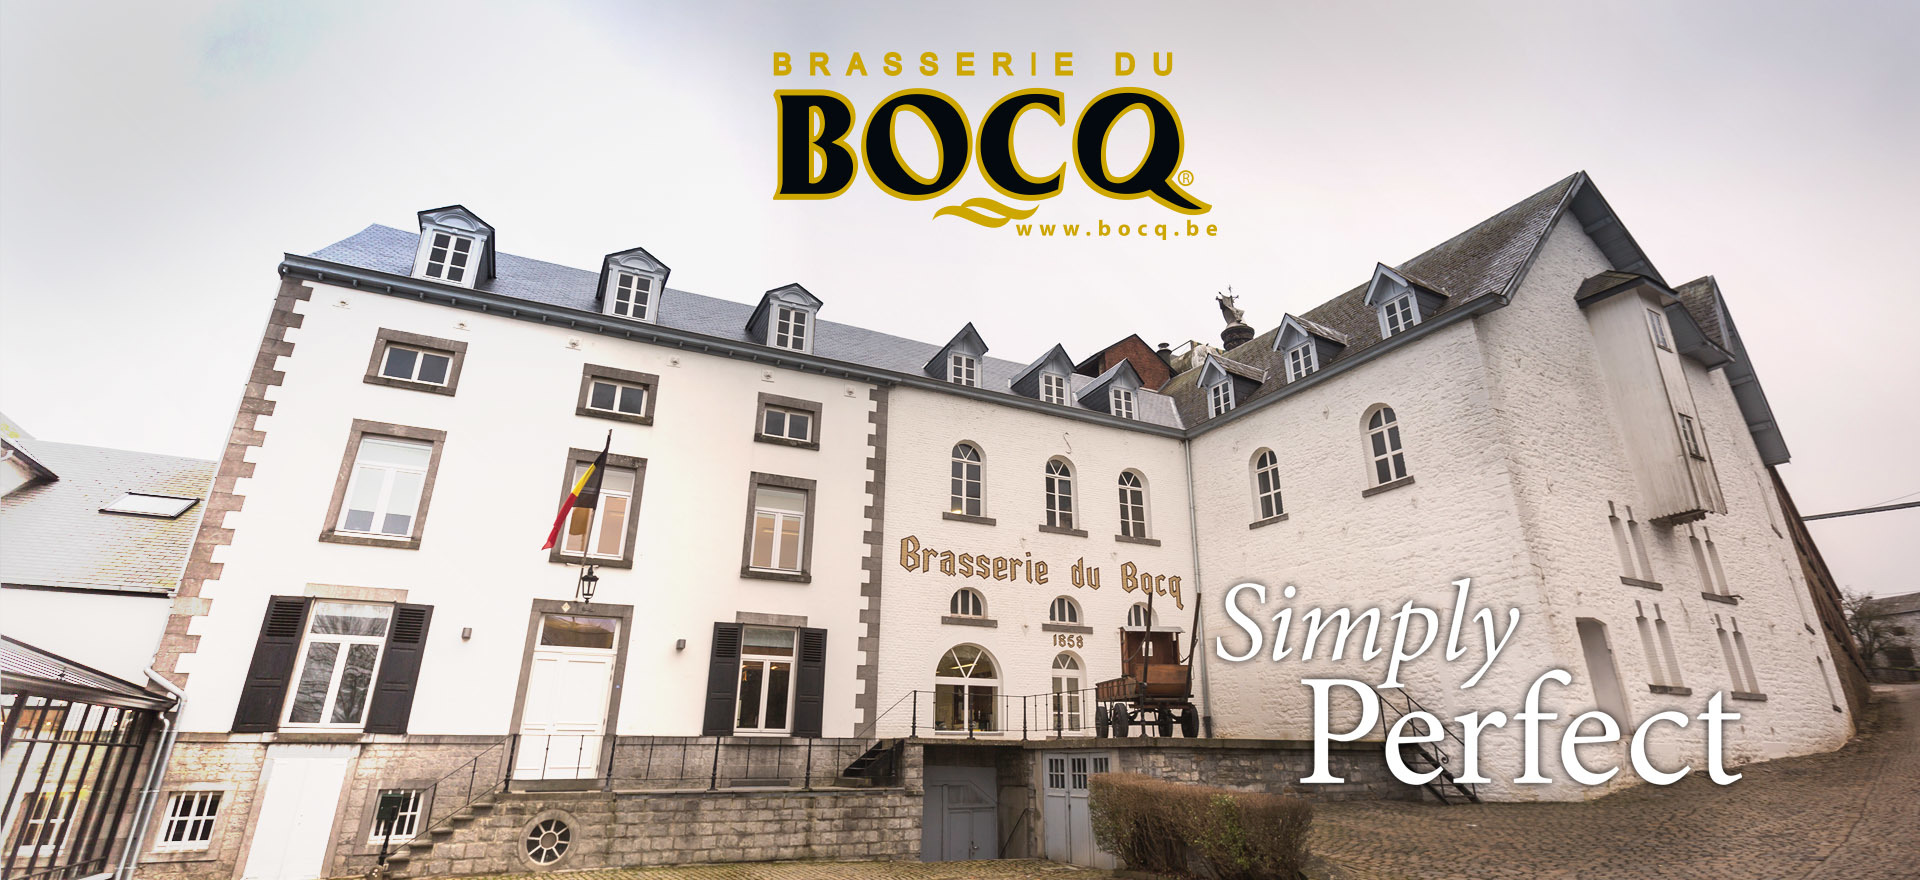 Logo van Brasserie Du Bocq gevestigd in Purnode uit Belgie